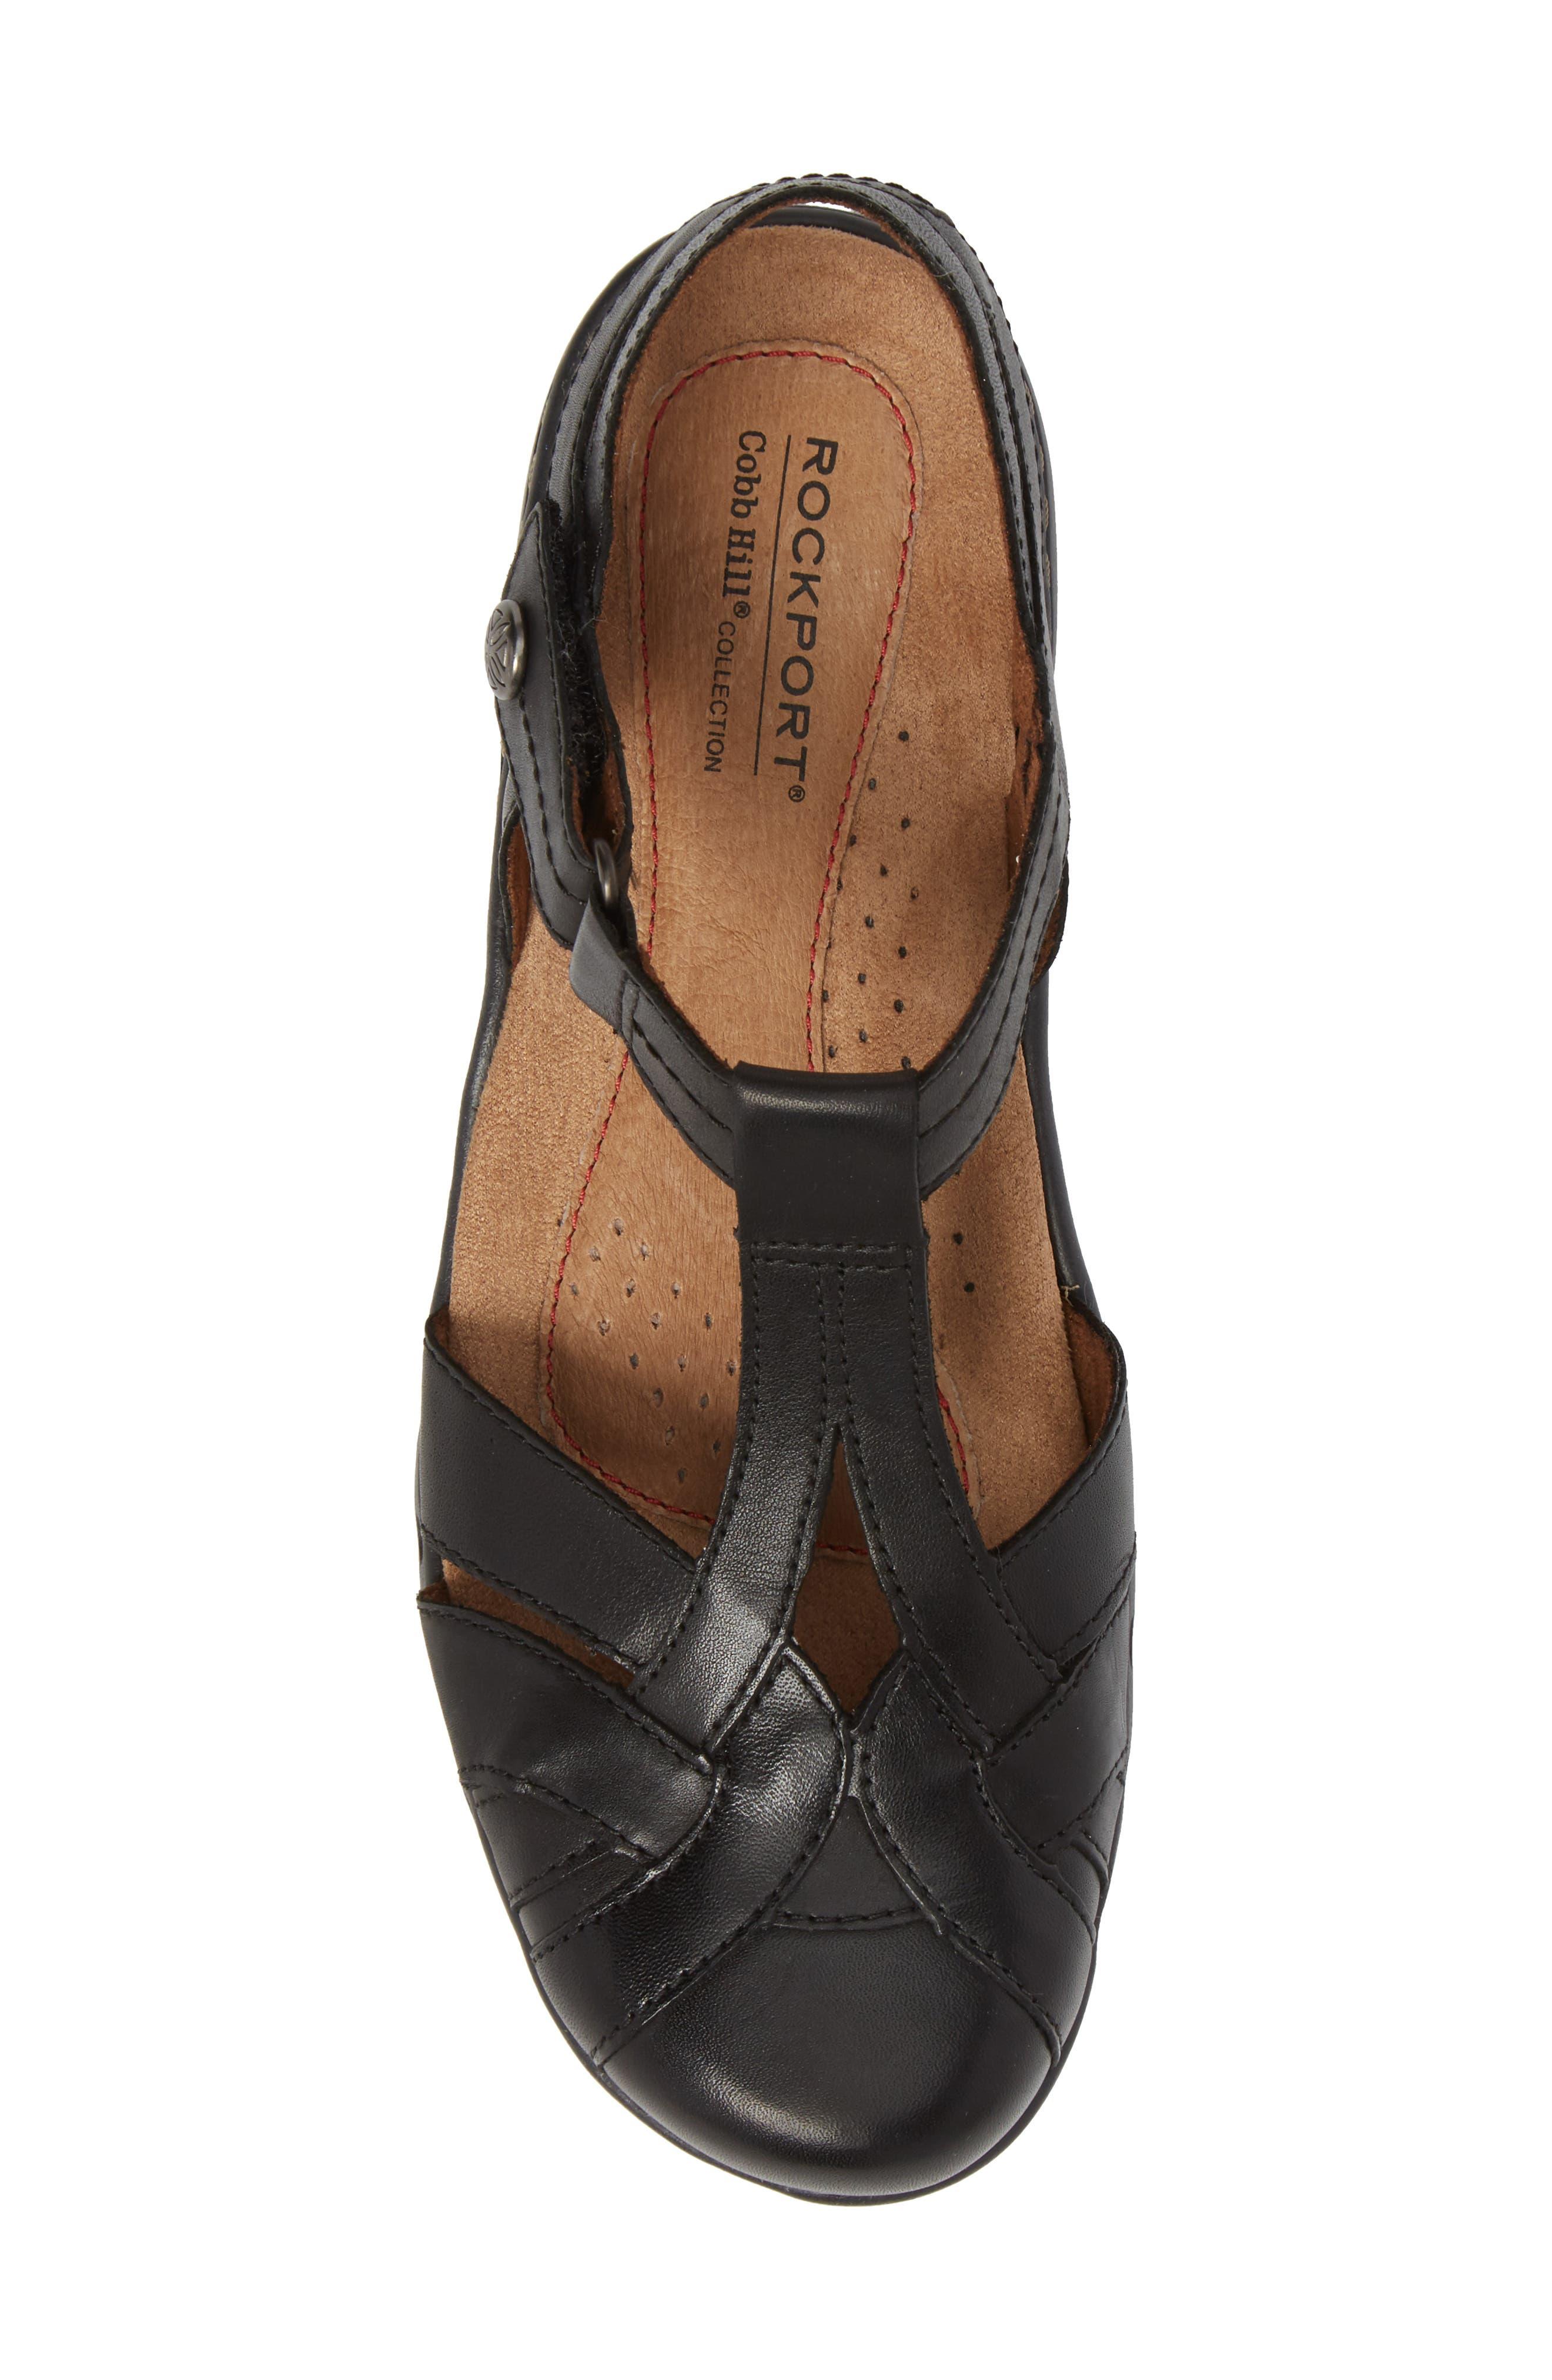 Penefield T-Strap Sandal,                             Alternate thumbnail 5, color,                             BLACK LEATHER